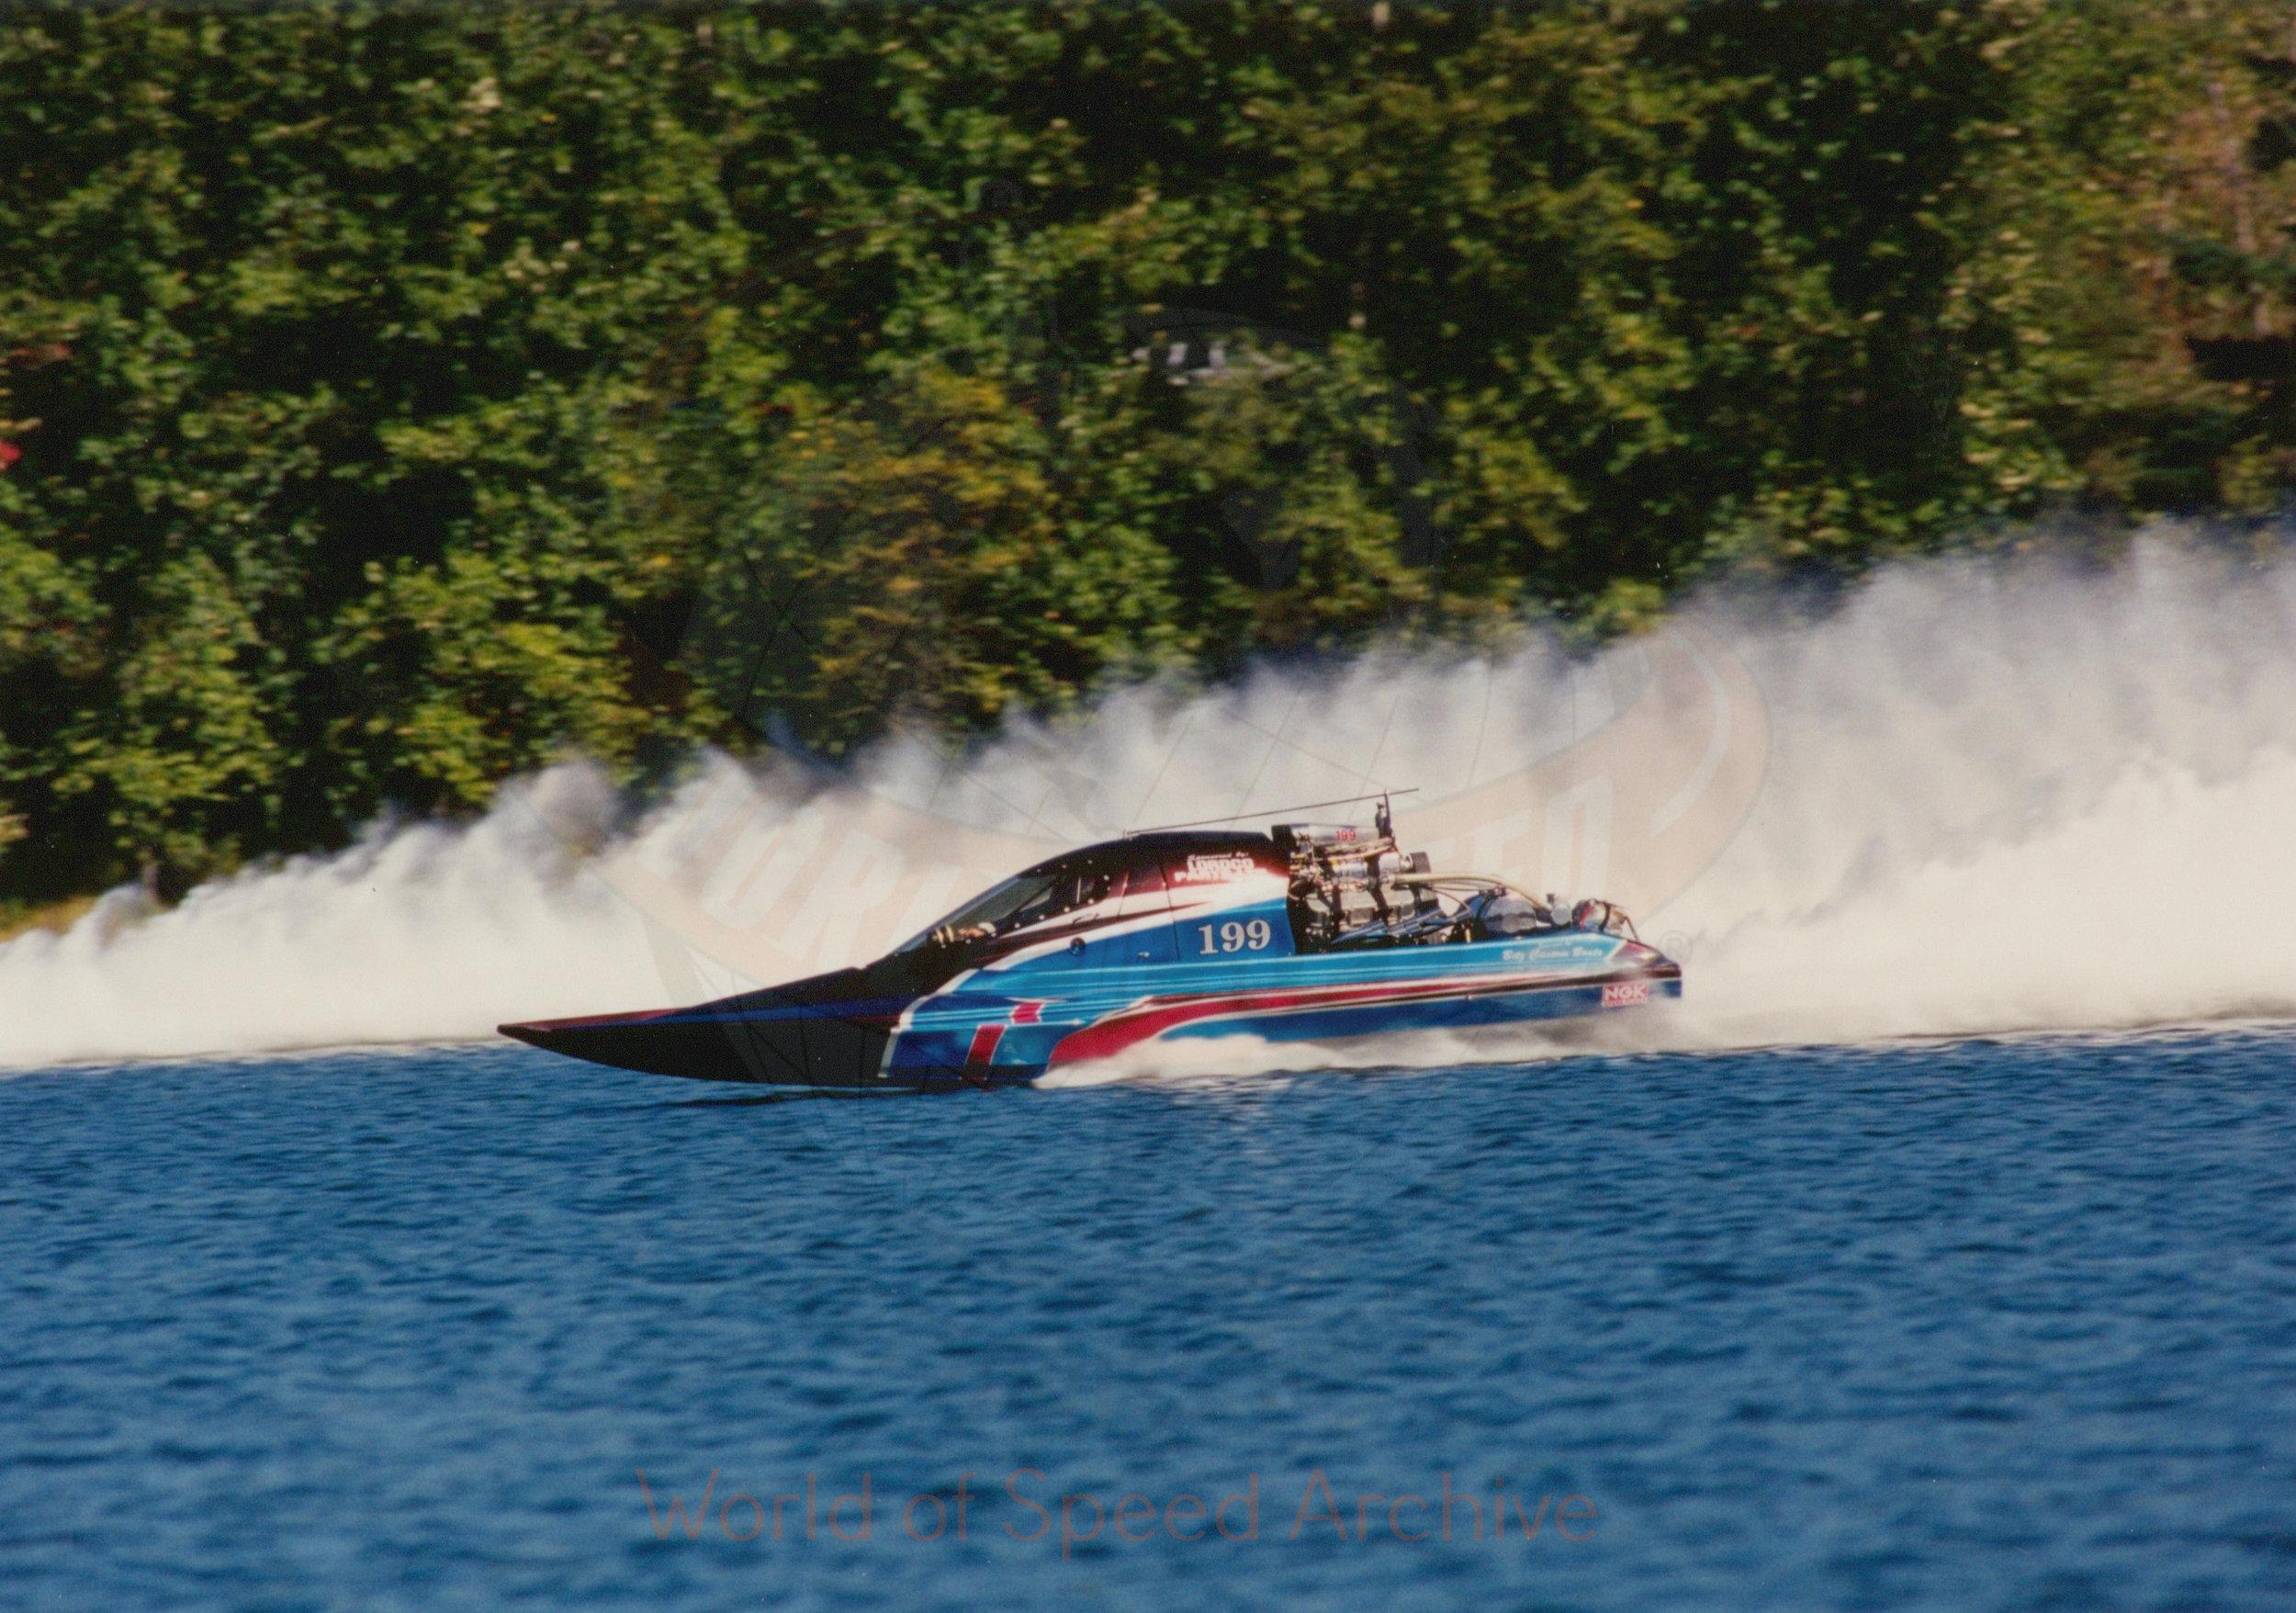 B7-S8-G1-F1-001 - boat racing